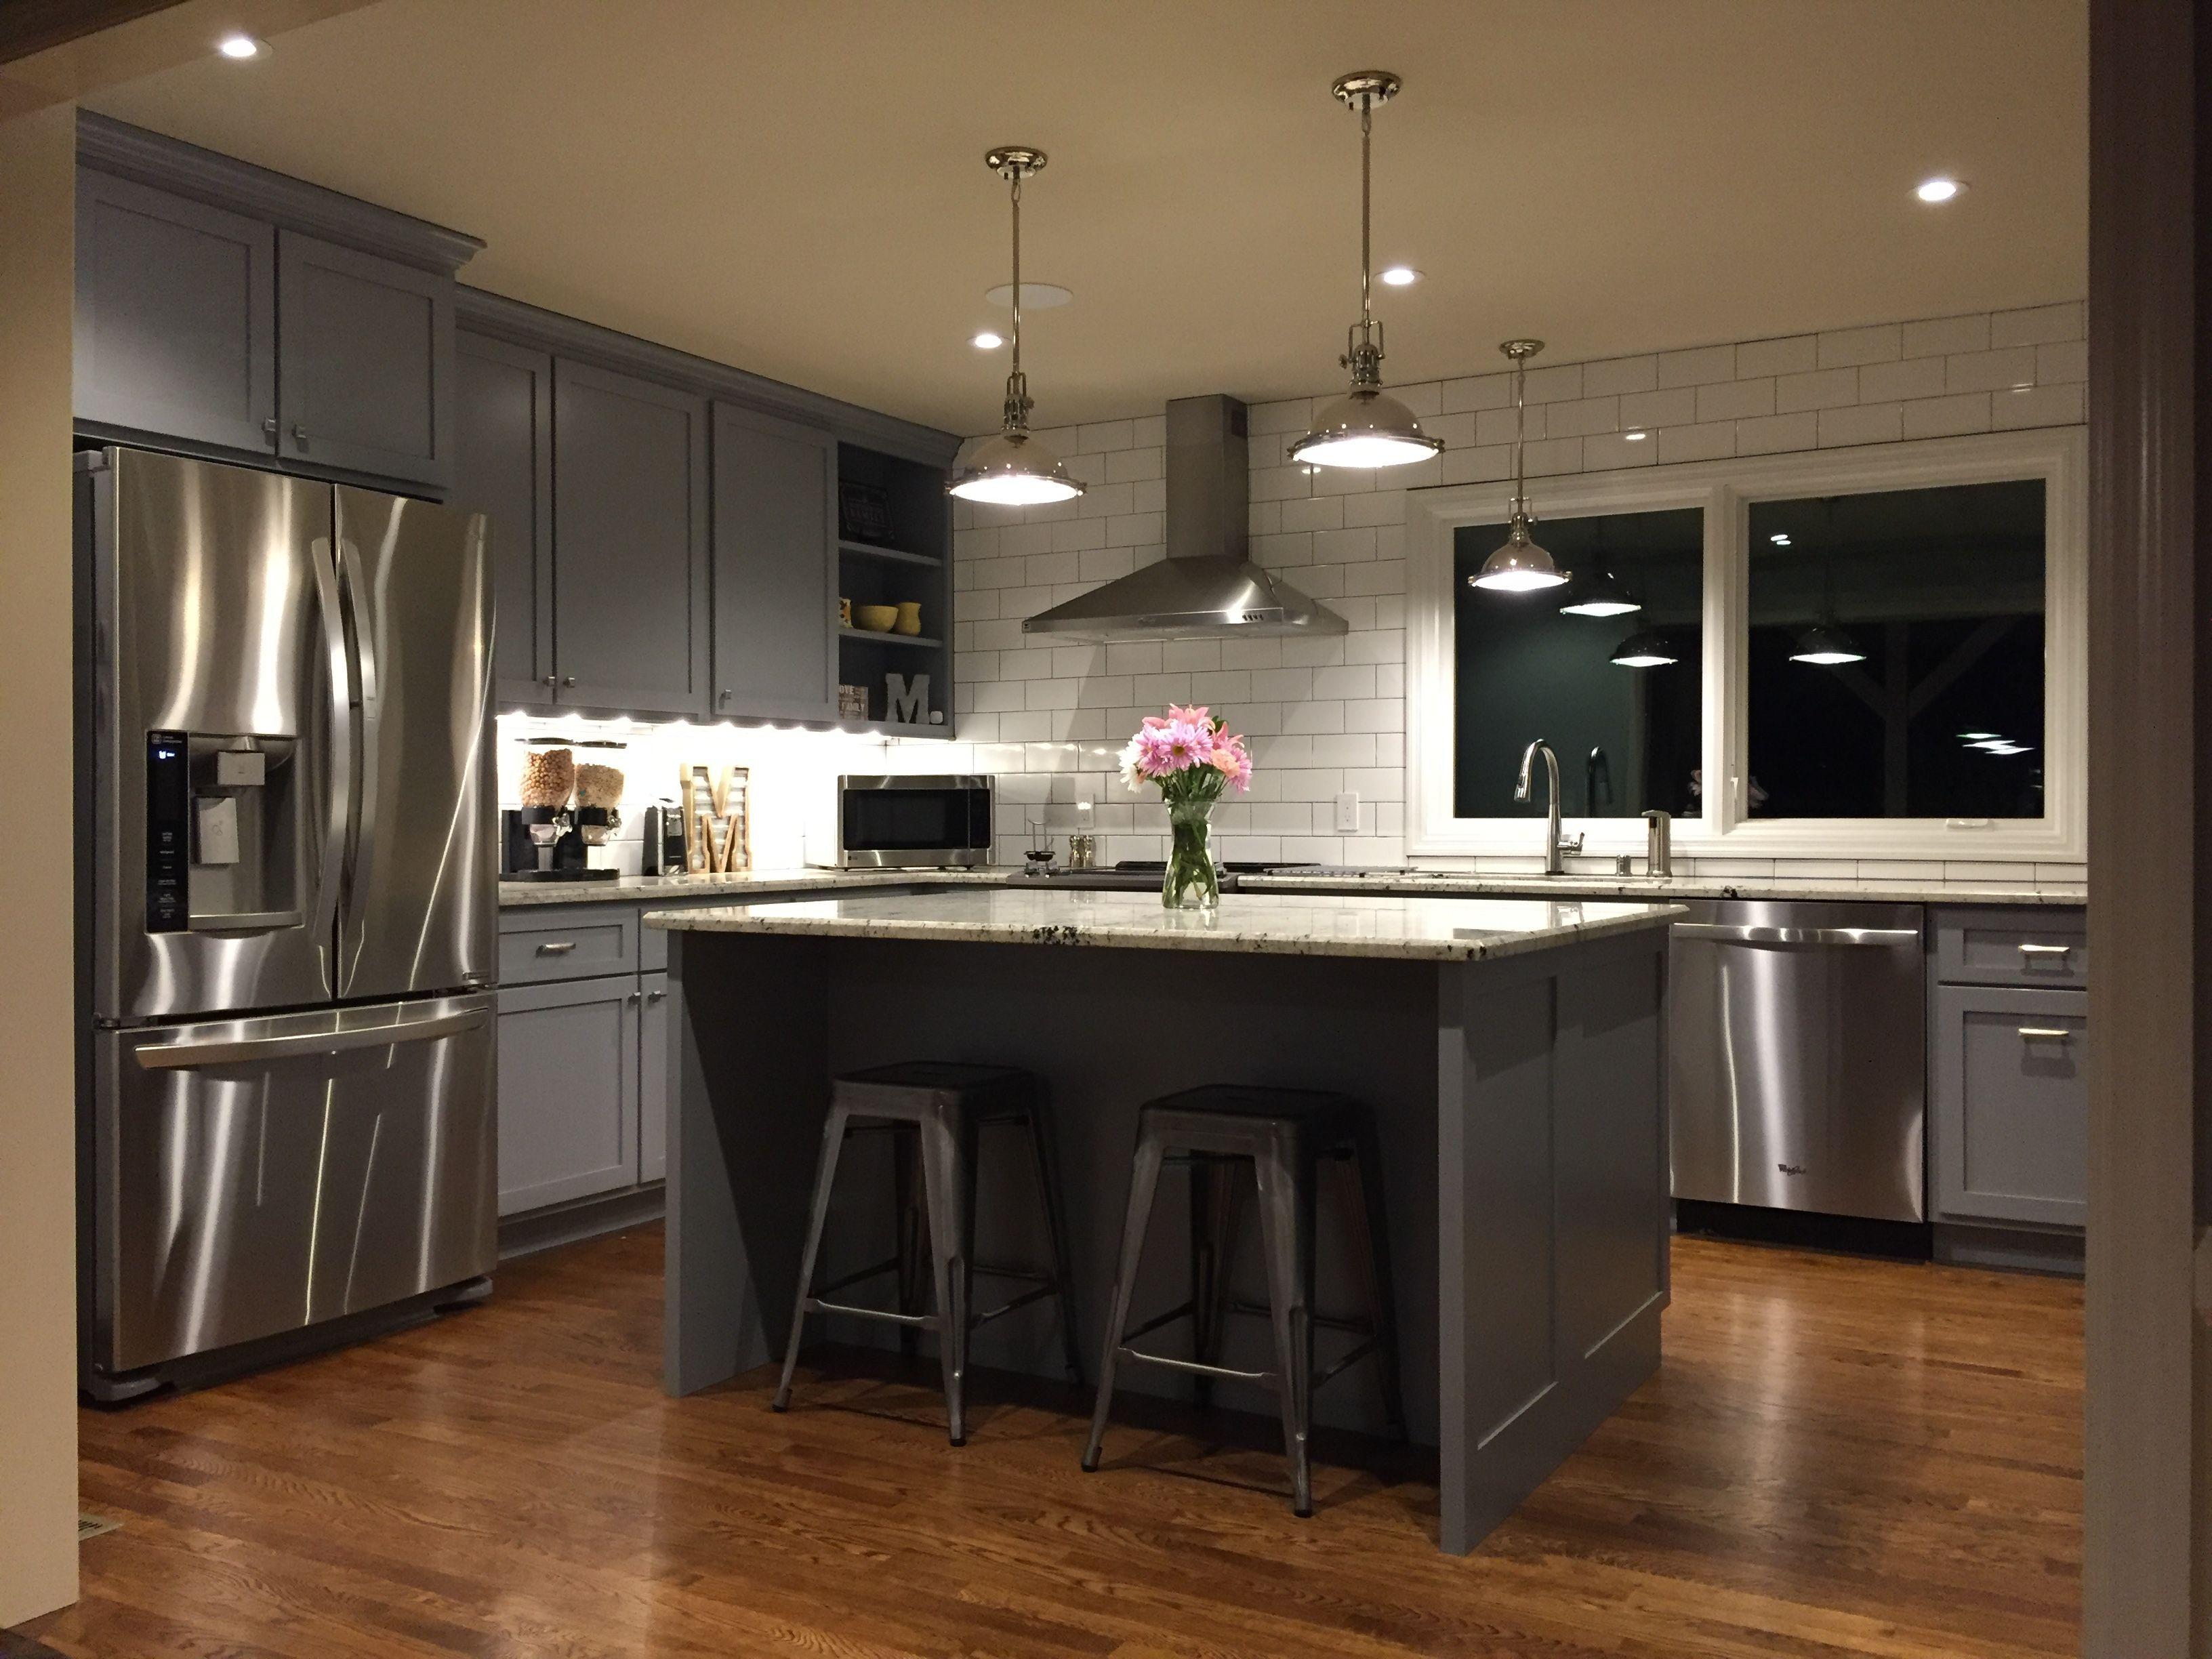 marvelous useful ideas lowes kitchen remodel open shelving 1960s rh pinterest com